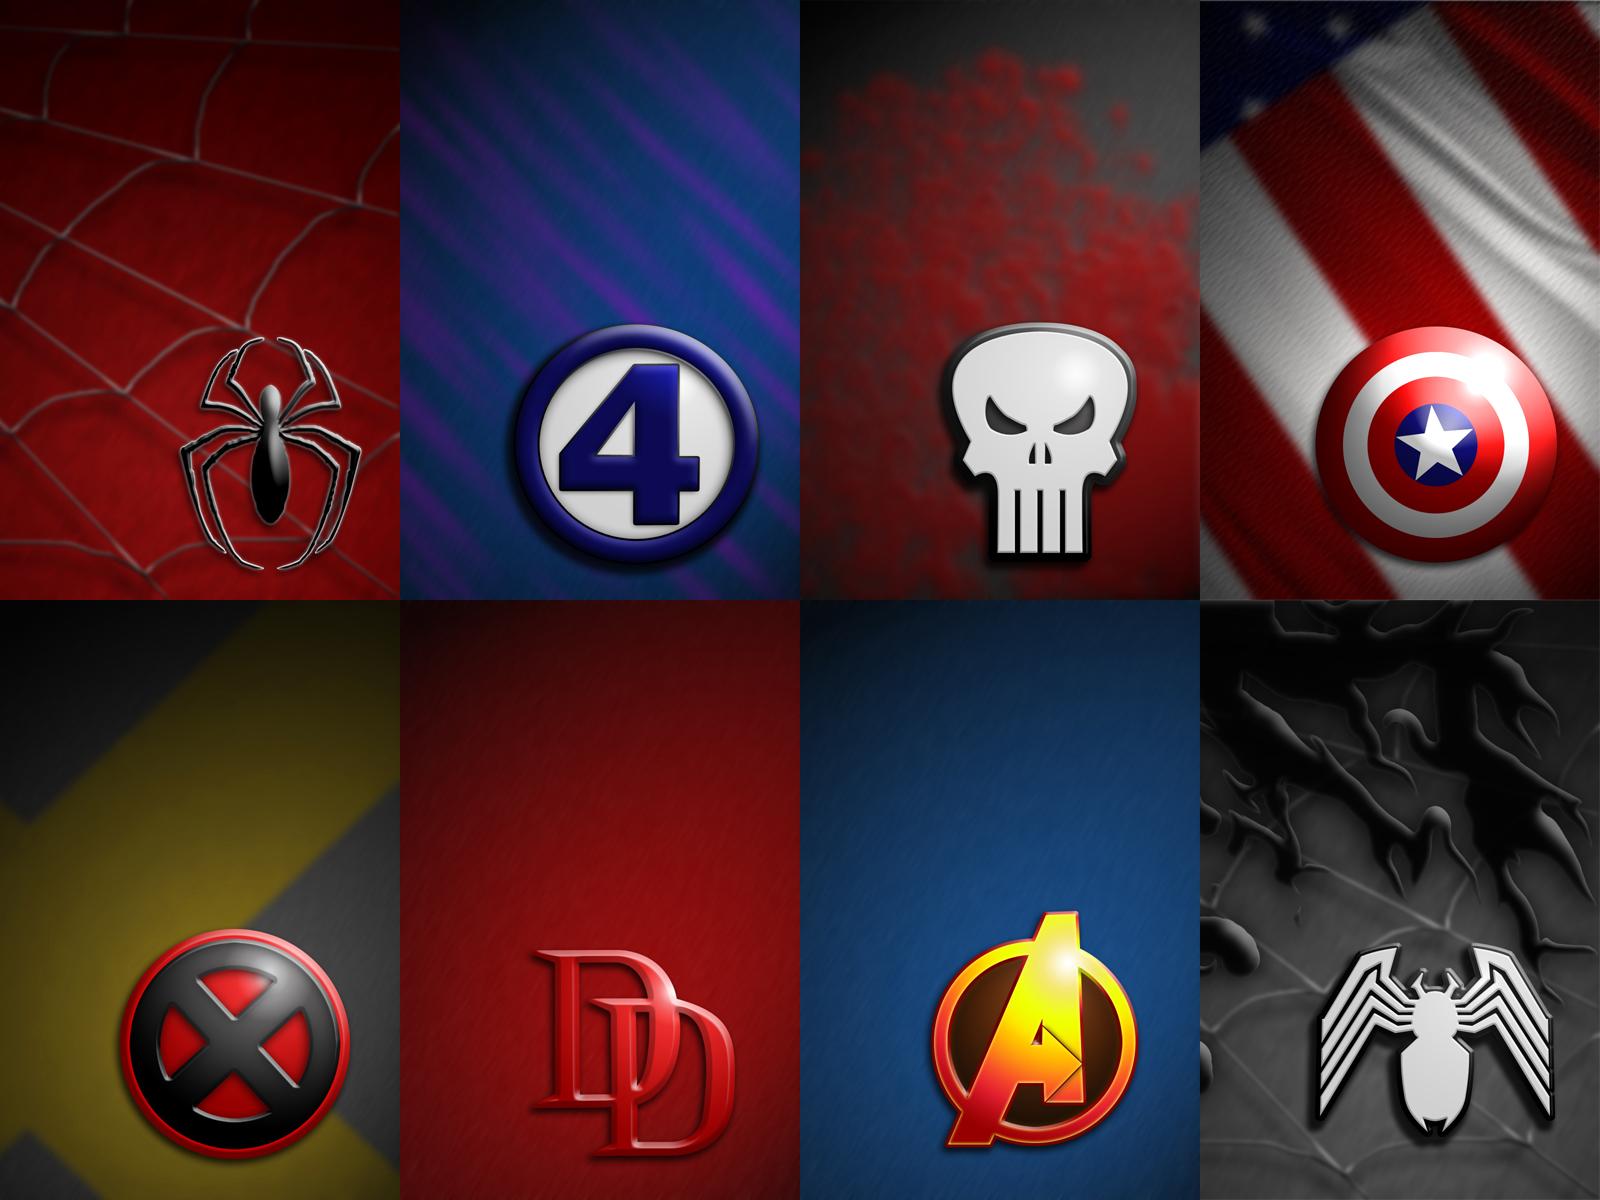 Marvel Logos Wallpaper Pack by BadlyDrawnDuck 1600x1200